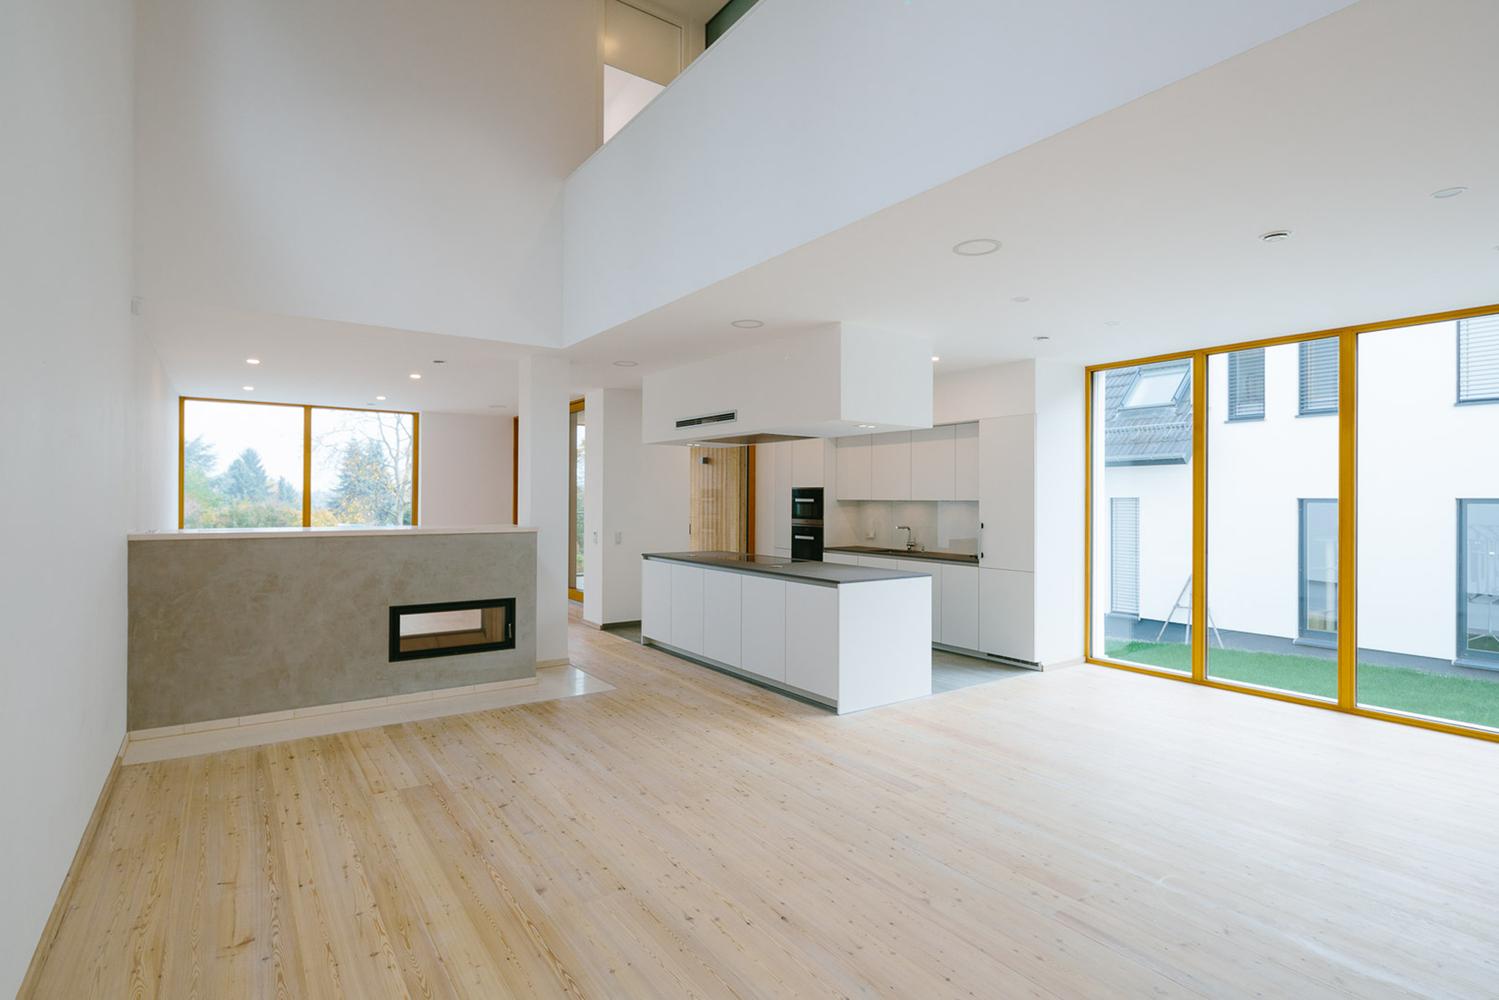 A \'house in house\' concept in Frankfurt by JOP Architekten ...